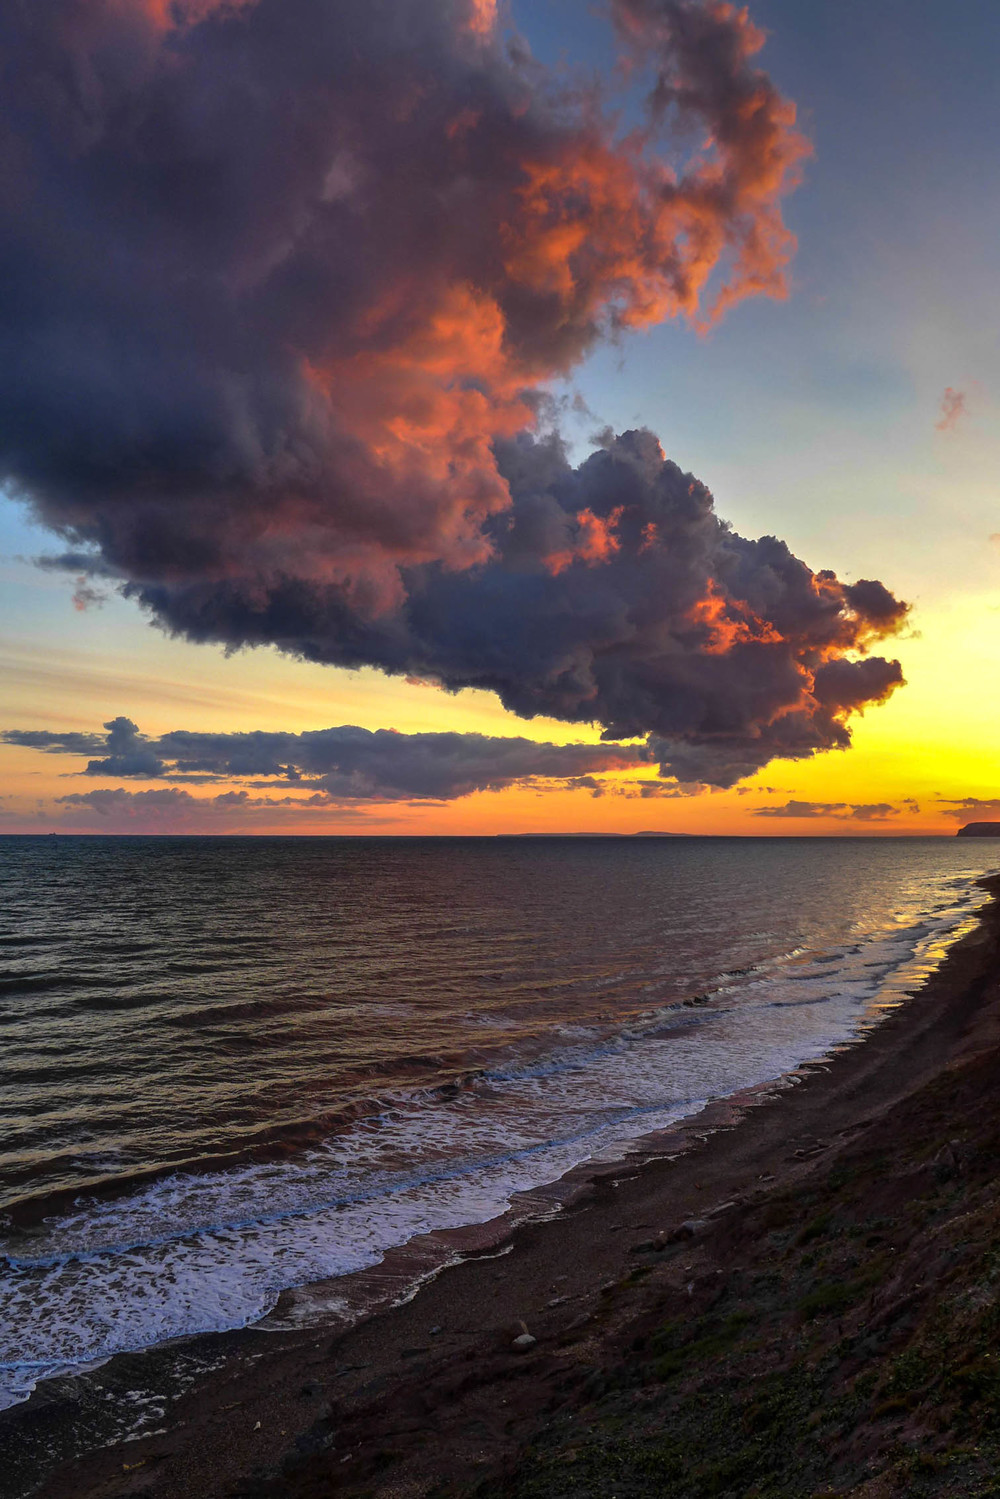 Isle of Wight sunset